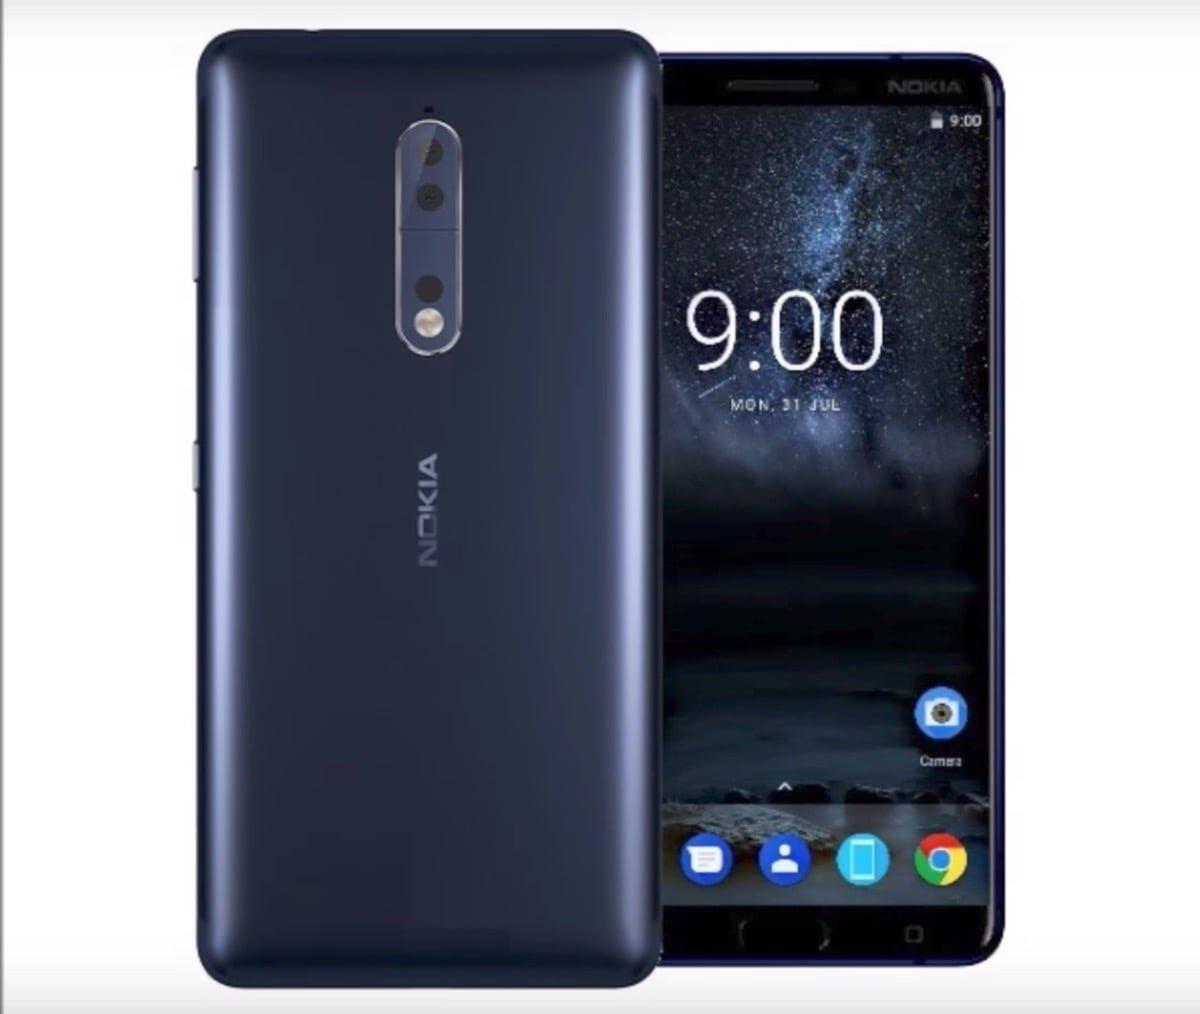 Nokia 9 выпустят вместе с Nokia 8 Pro